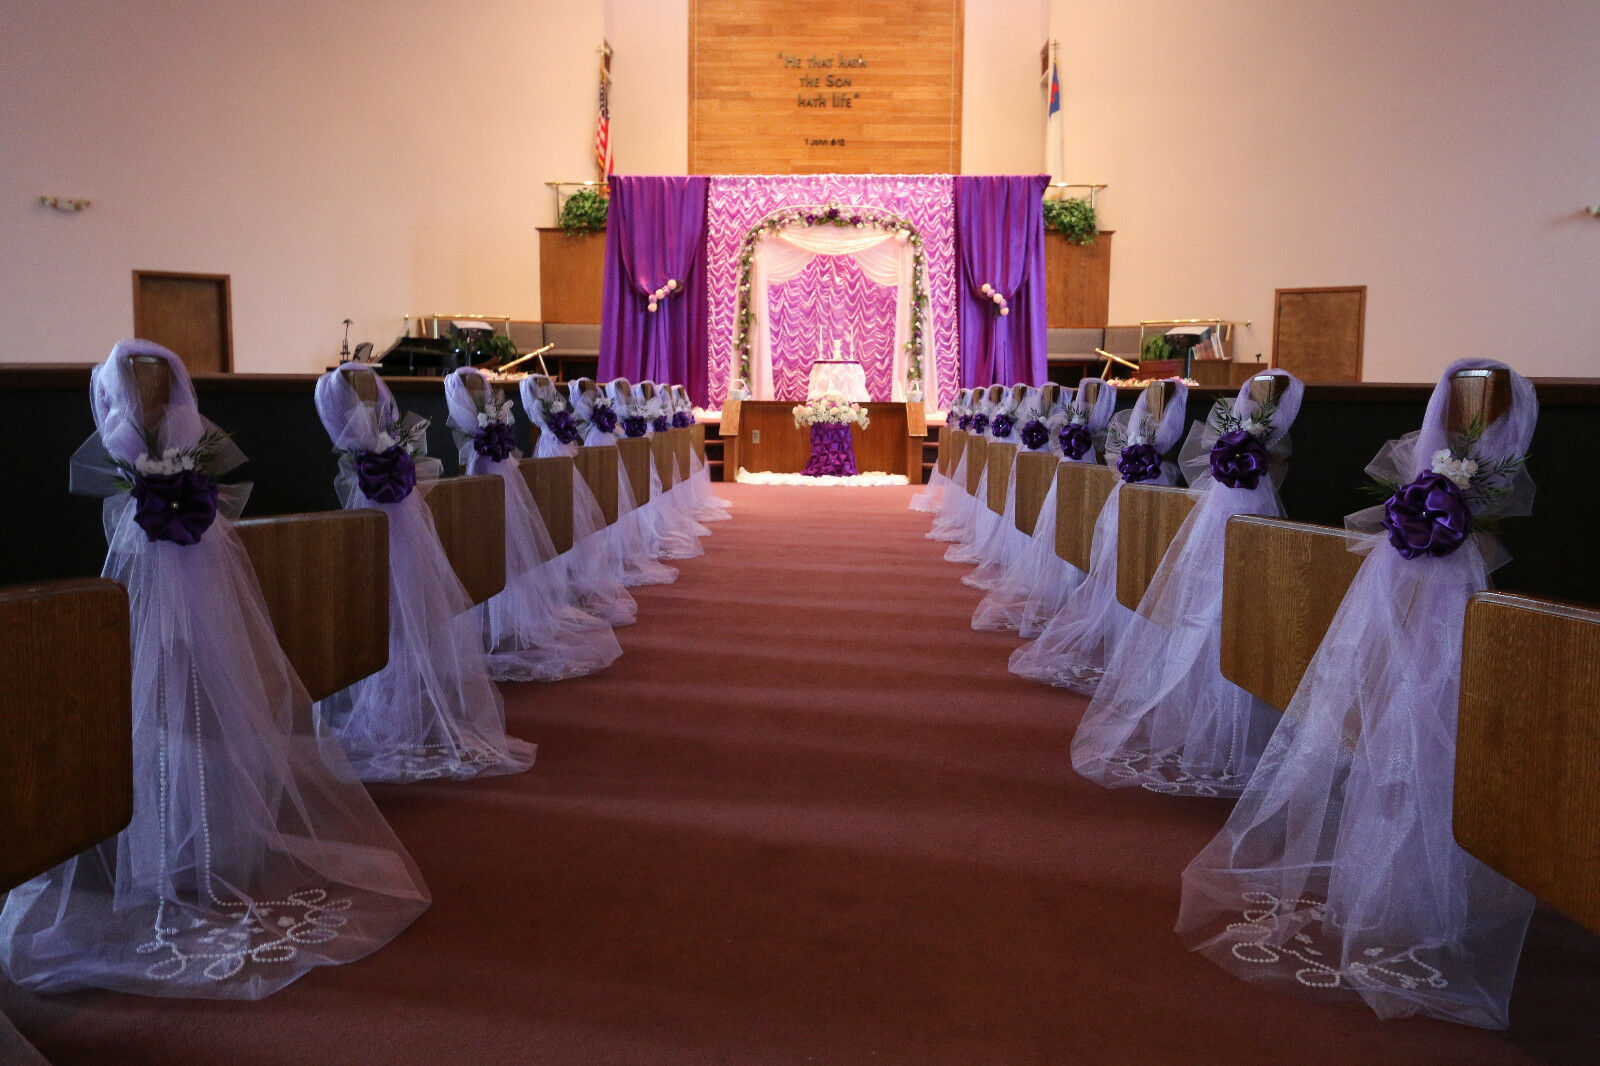 Purple Wedding Decorations Chair Bows Pew Bows Satin Church Aisle Decor